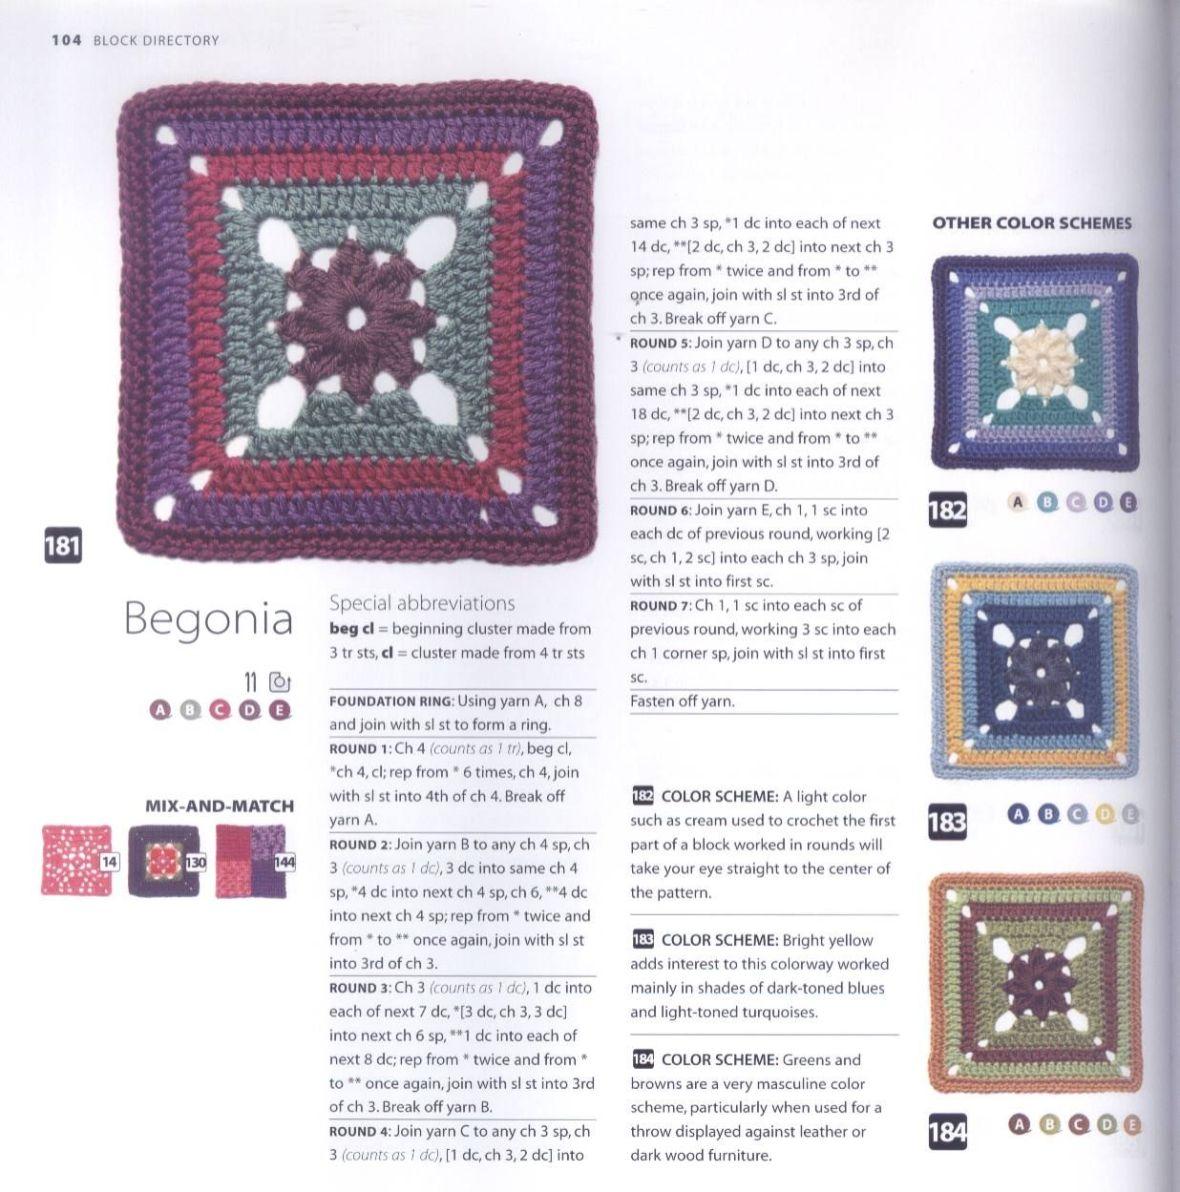 200 Crocheted Blocks for blankets, throws & Afghans 104